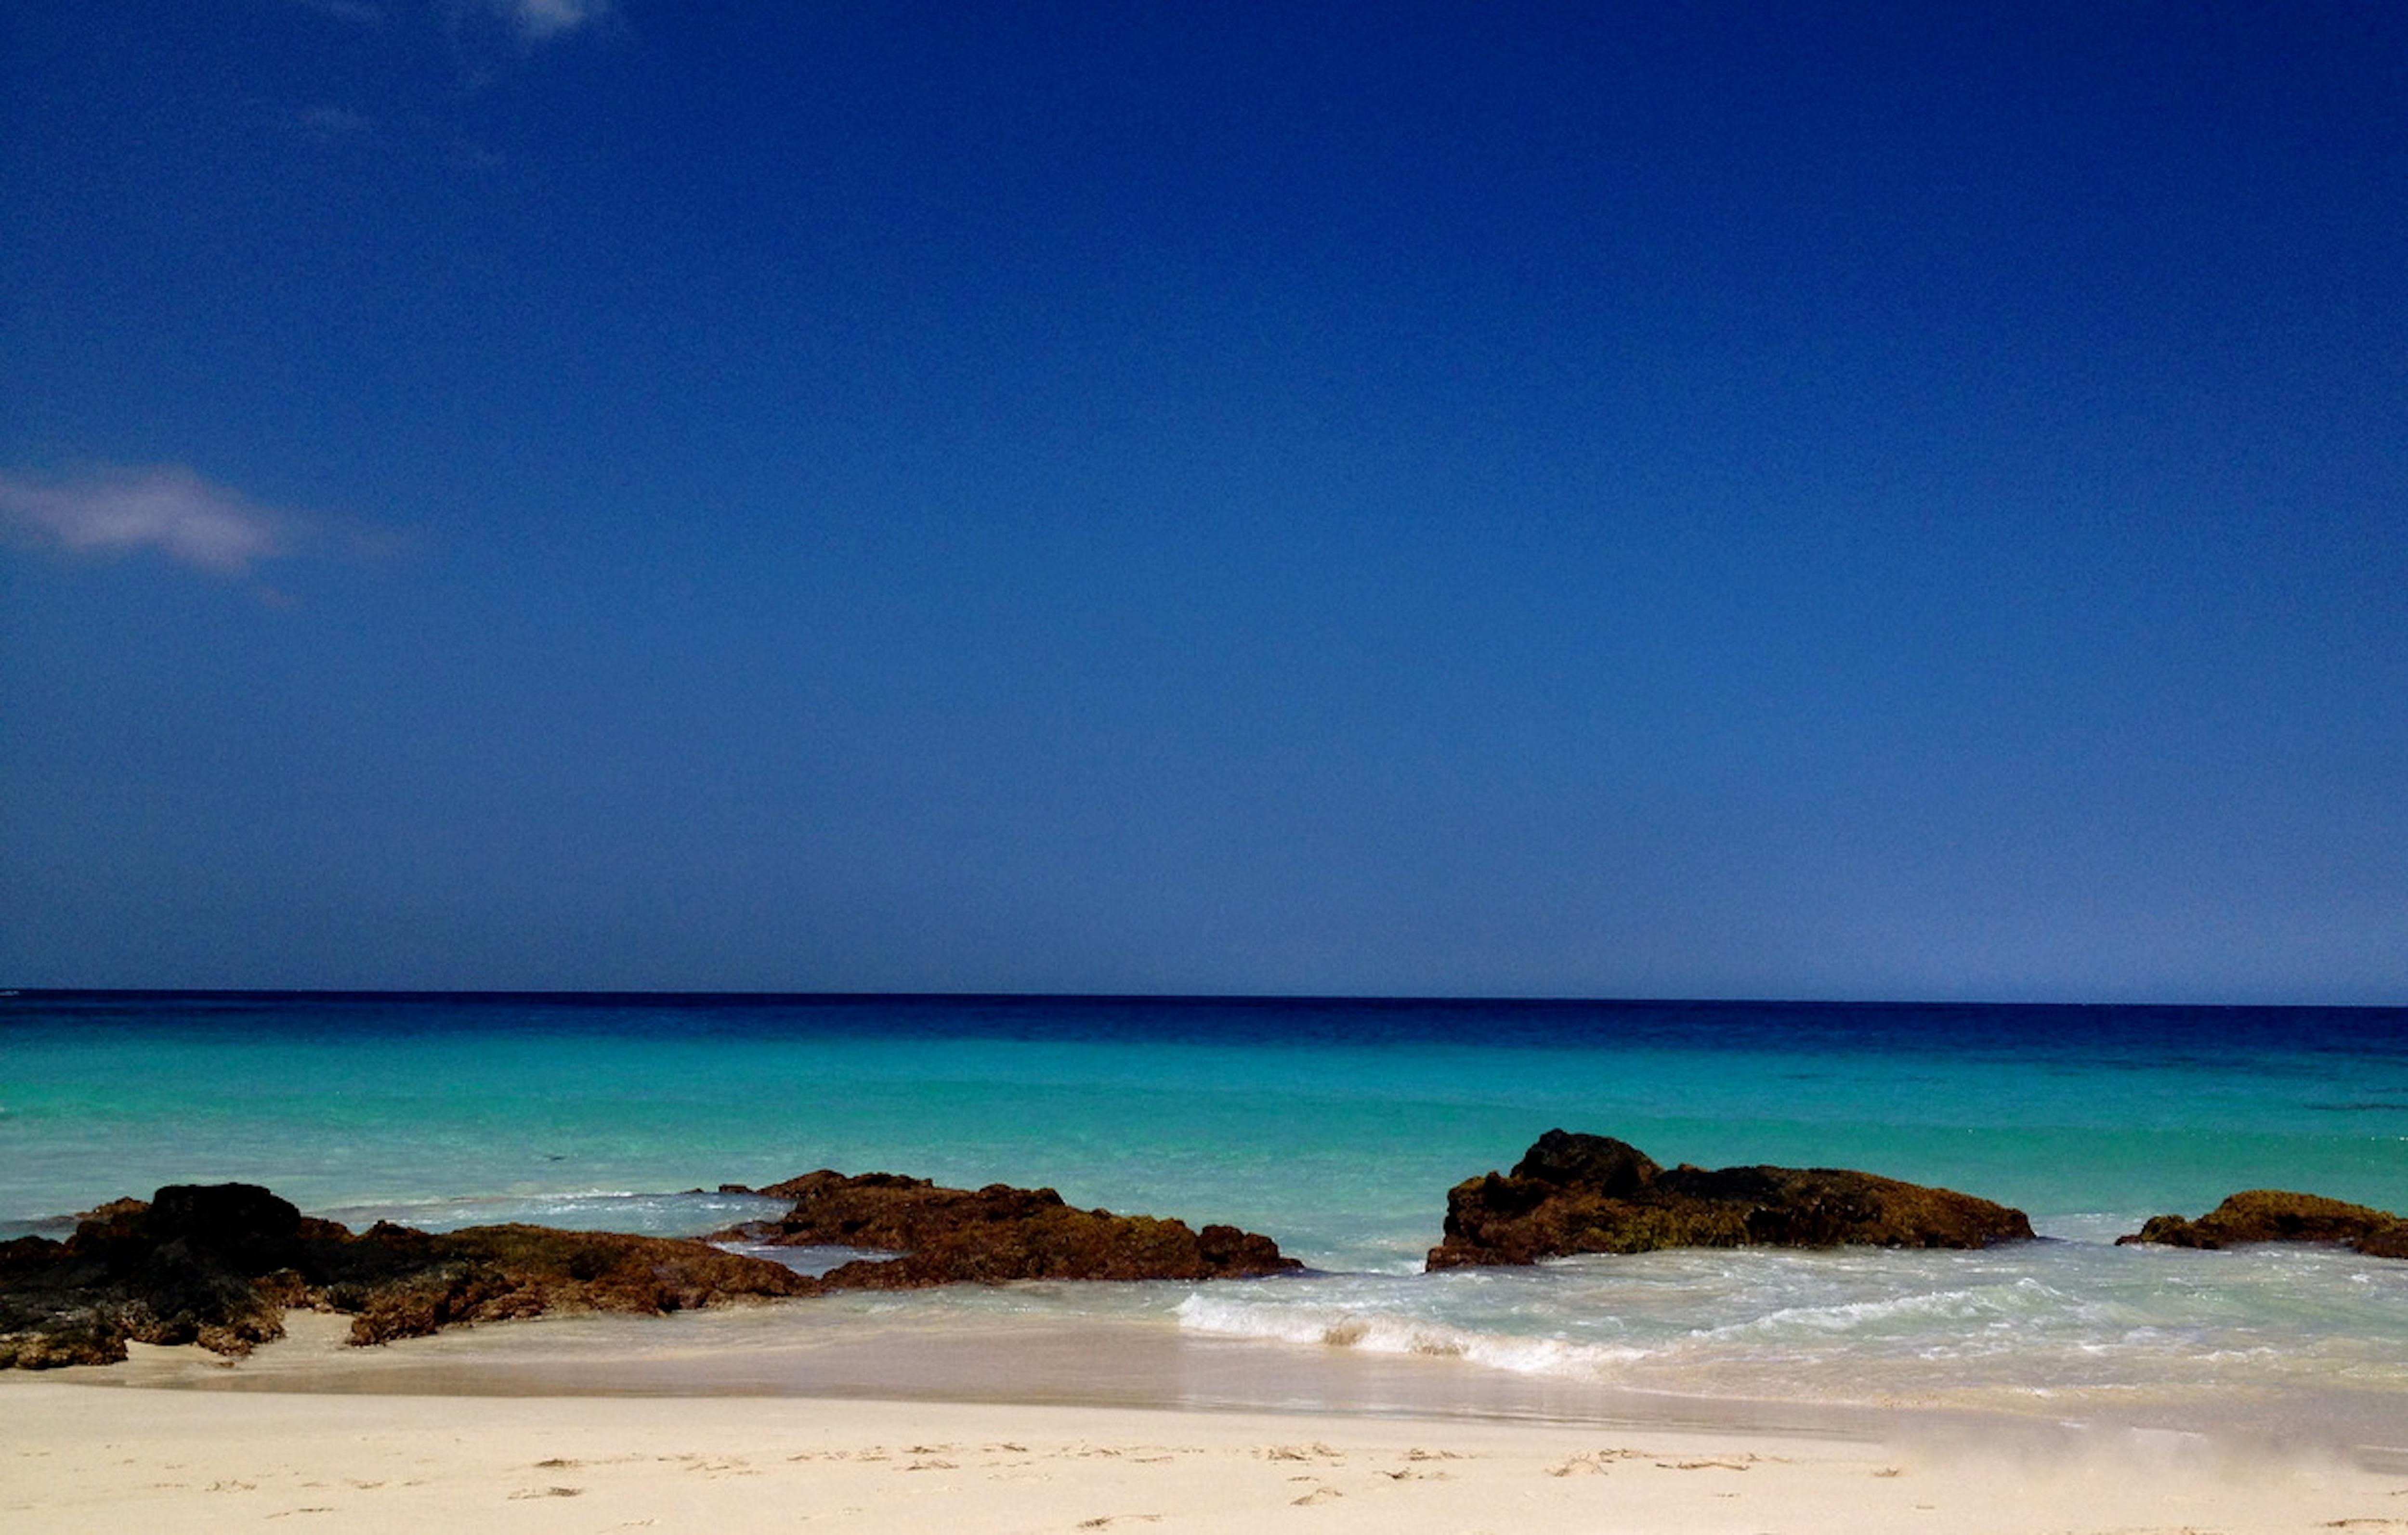 The Big Island Of Hawaii Has No Beaches